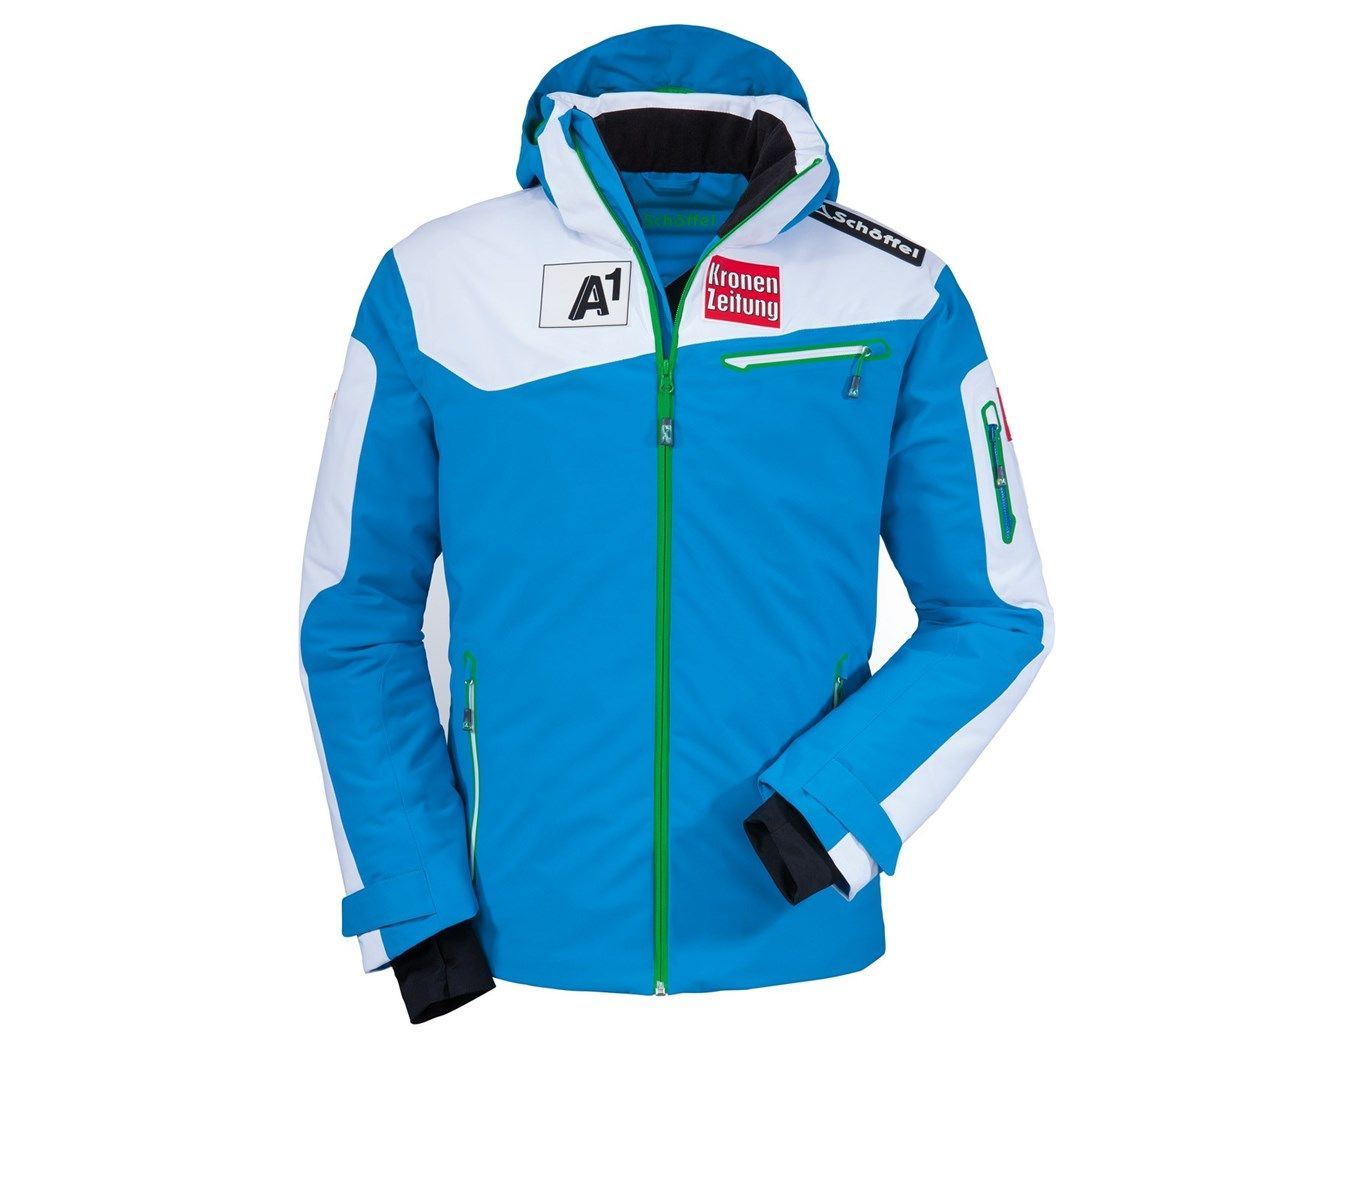 Schoffel Austria Cian Race Team Mens Jacket 352 00 Jackets Team Jackets Mens Jackets [ 1200 x 1350 Pixel ]